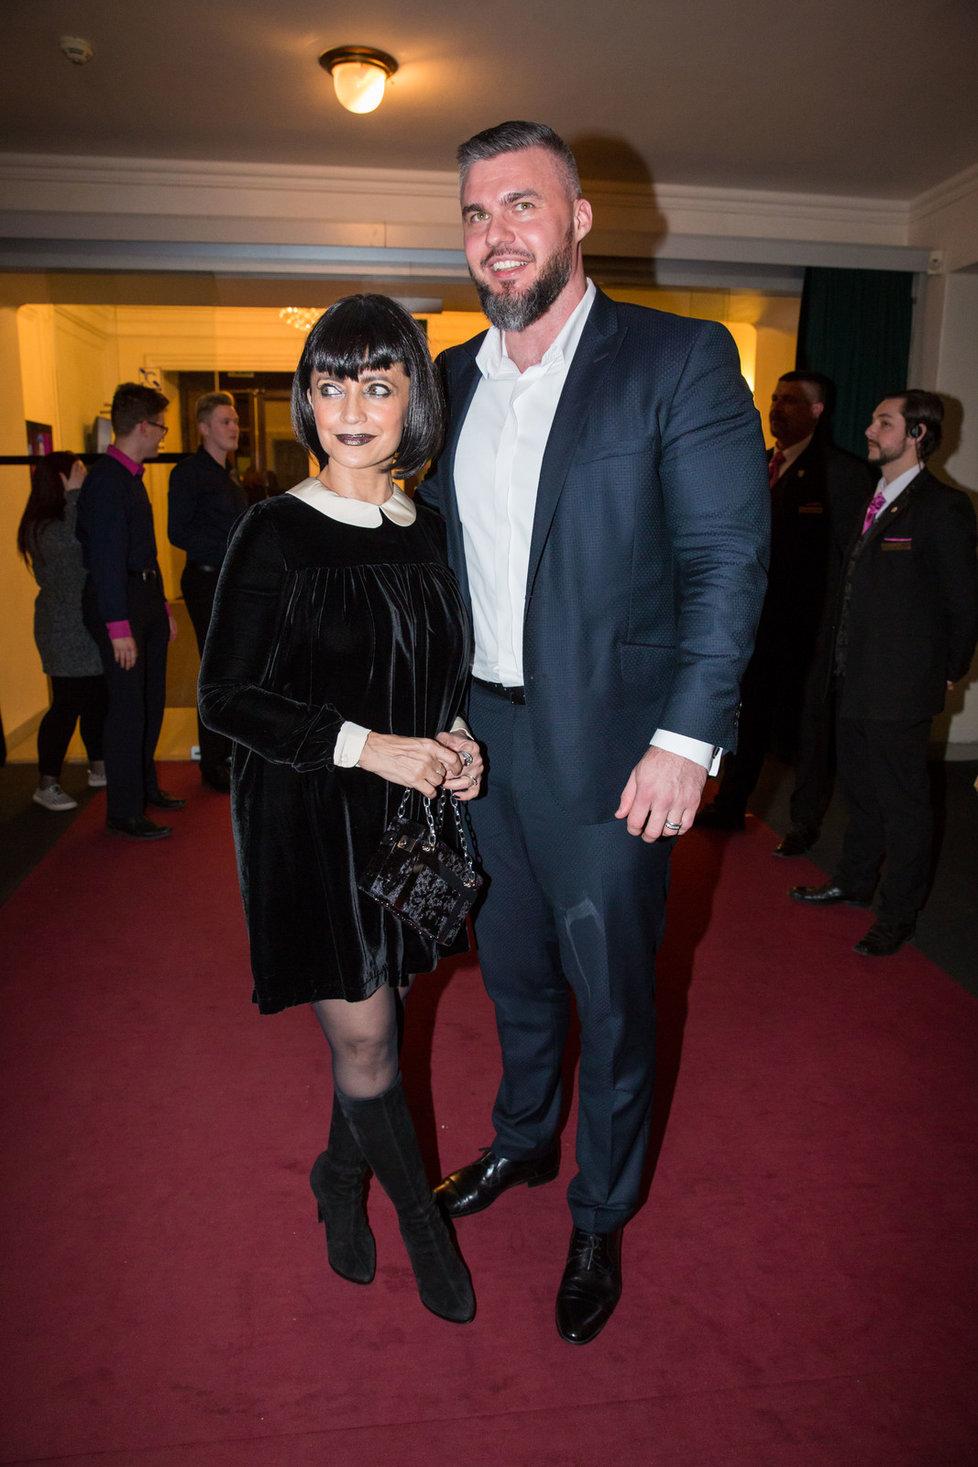 Lucie Bílá s partnerem Radkem Filipim na obnovené premiéře muzikálu The Addams Family.